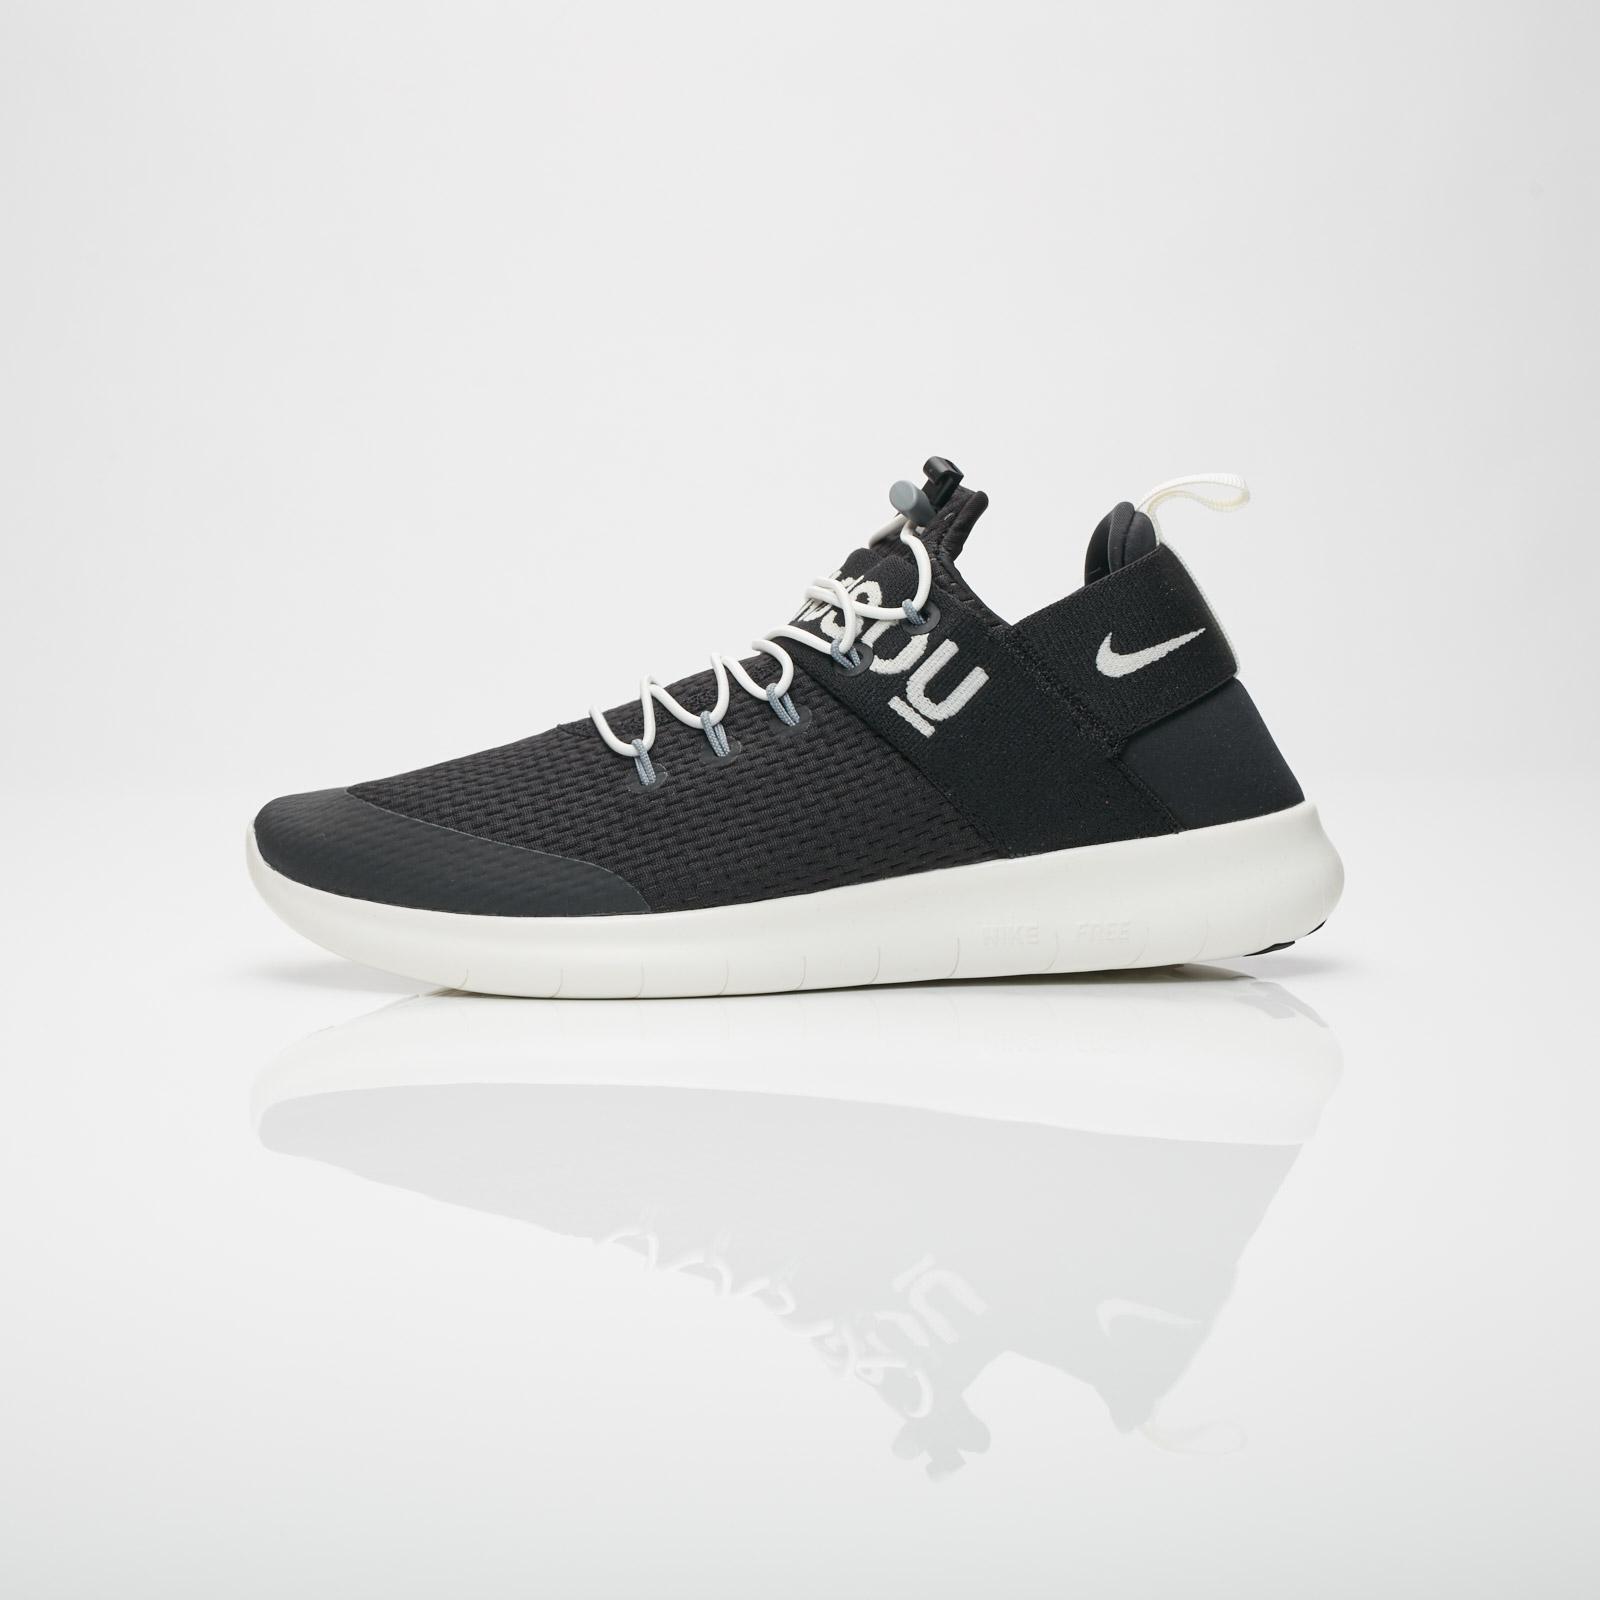 ... Nike Running Free Run CMTR 2017 ...